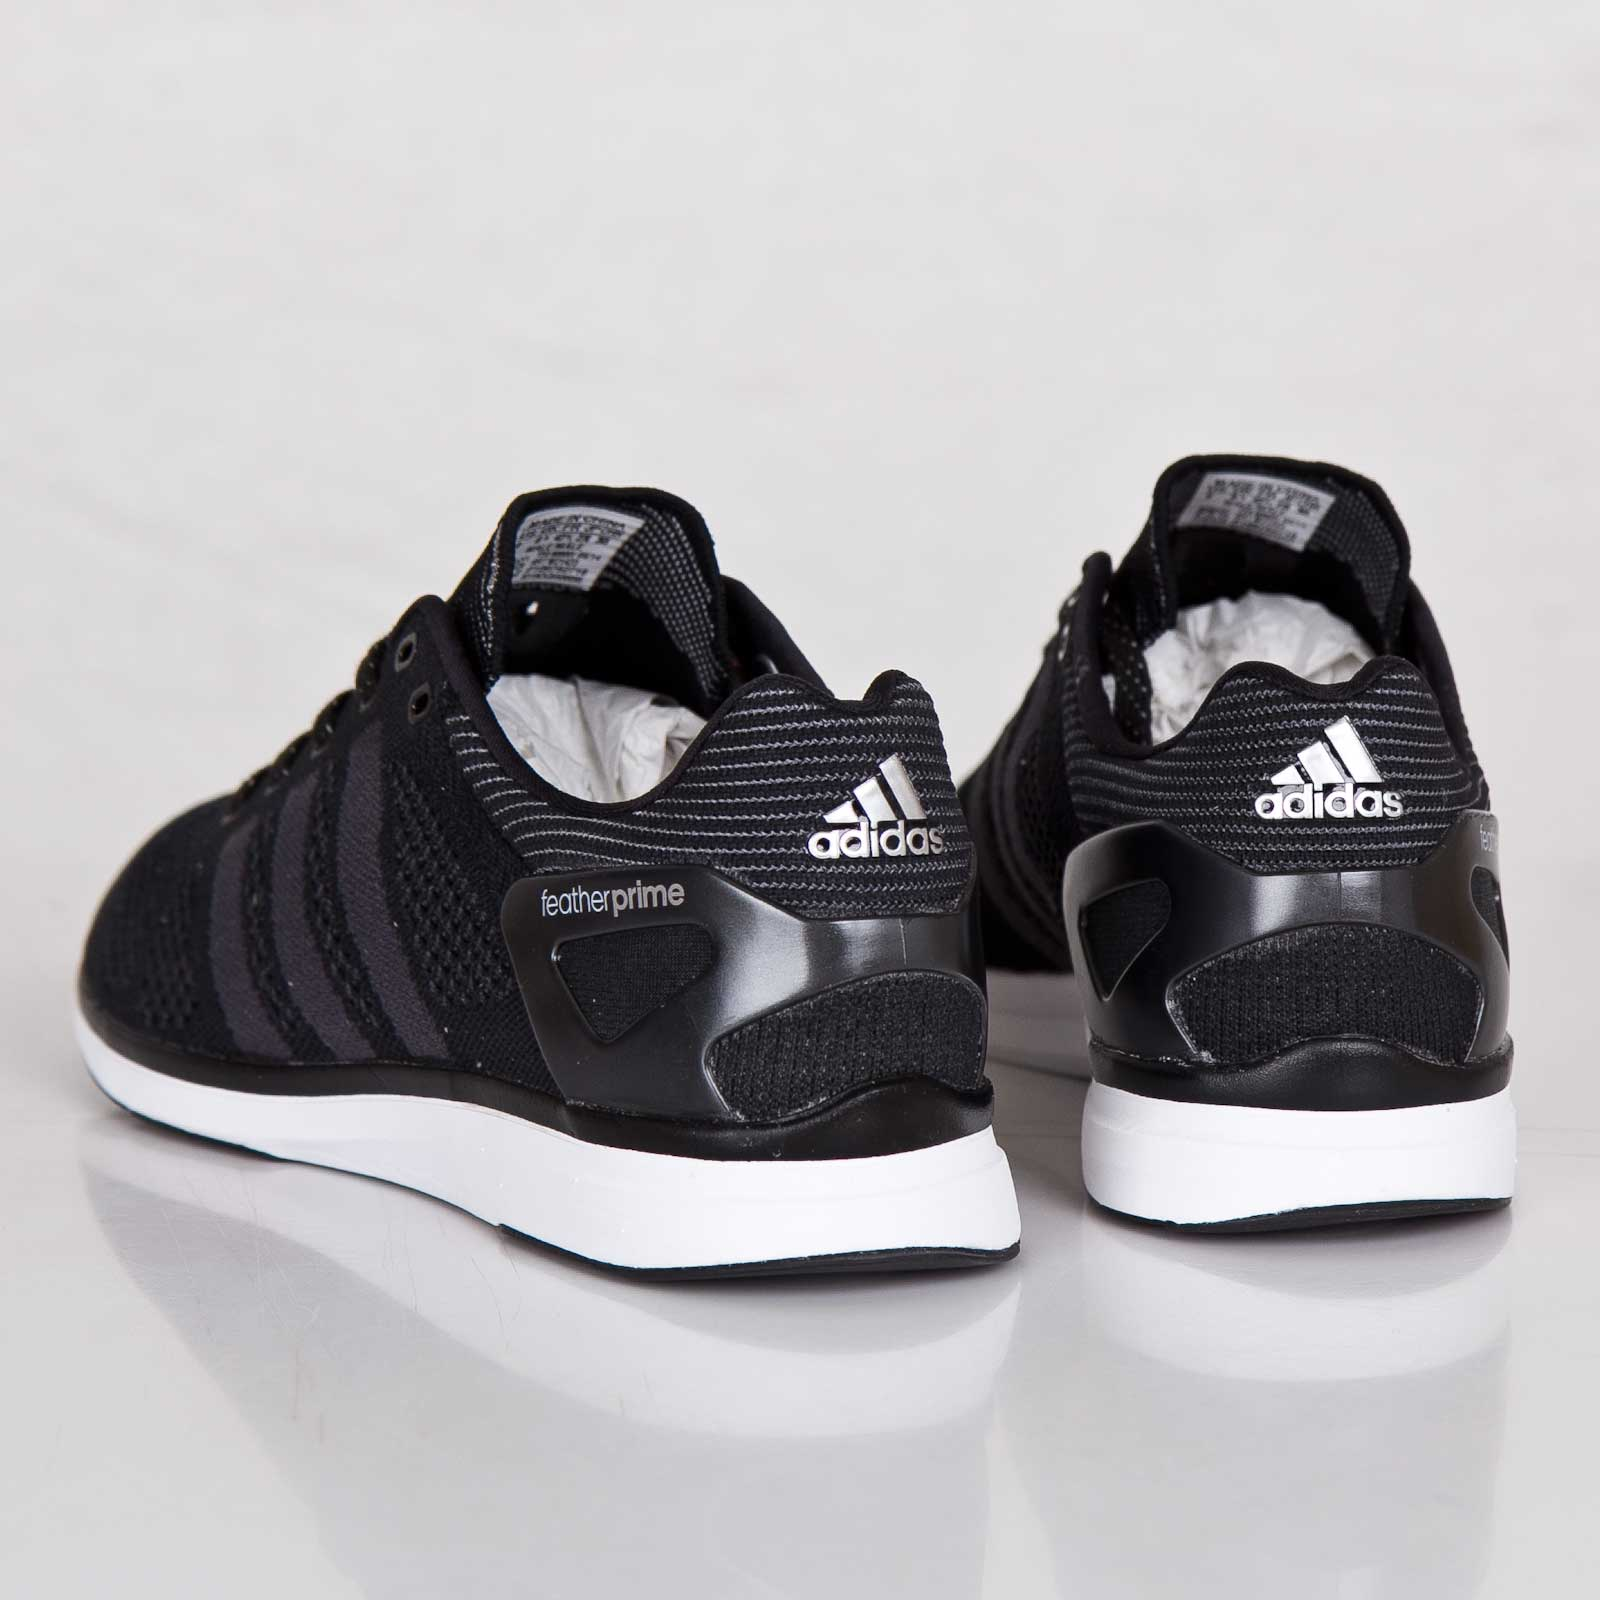 Adidas adizero Feather primer M m21423 sneakersnstuff Sneakers